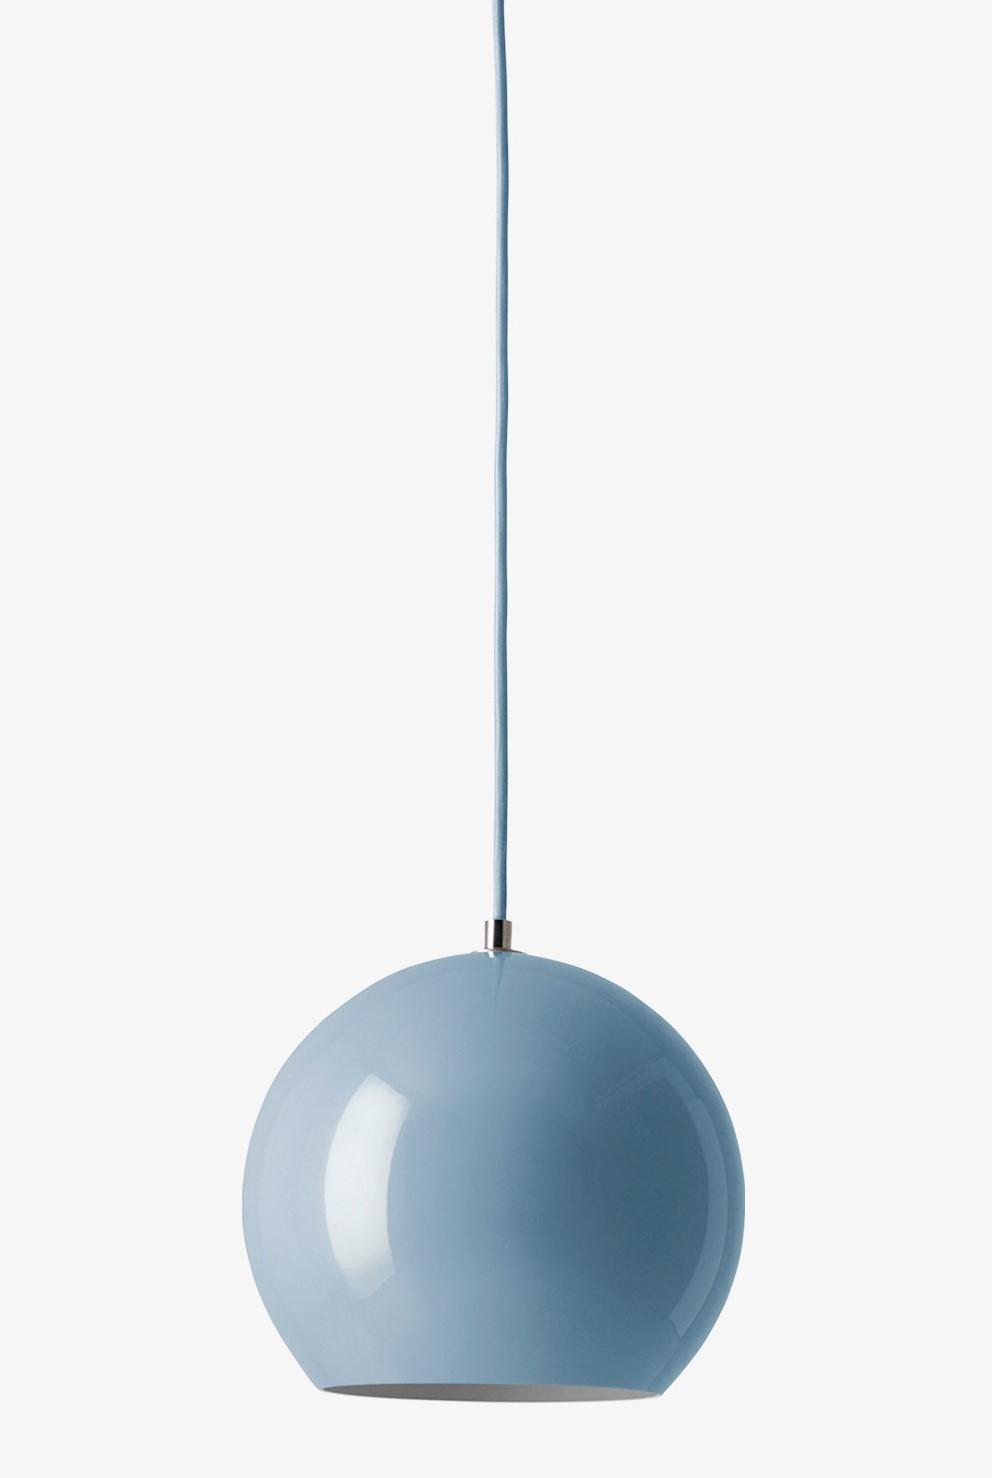 tradition Topan VP6 hanglamp Licht blauw